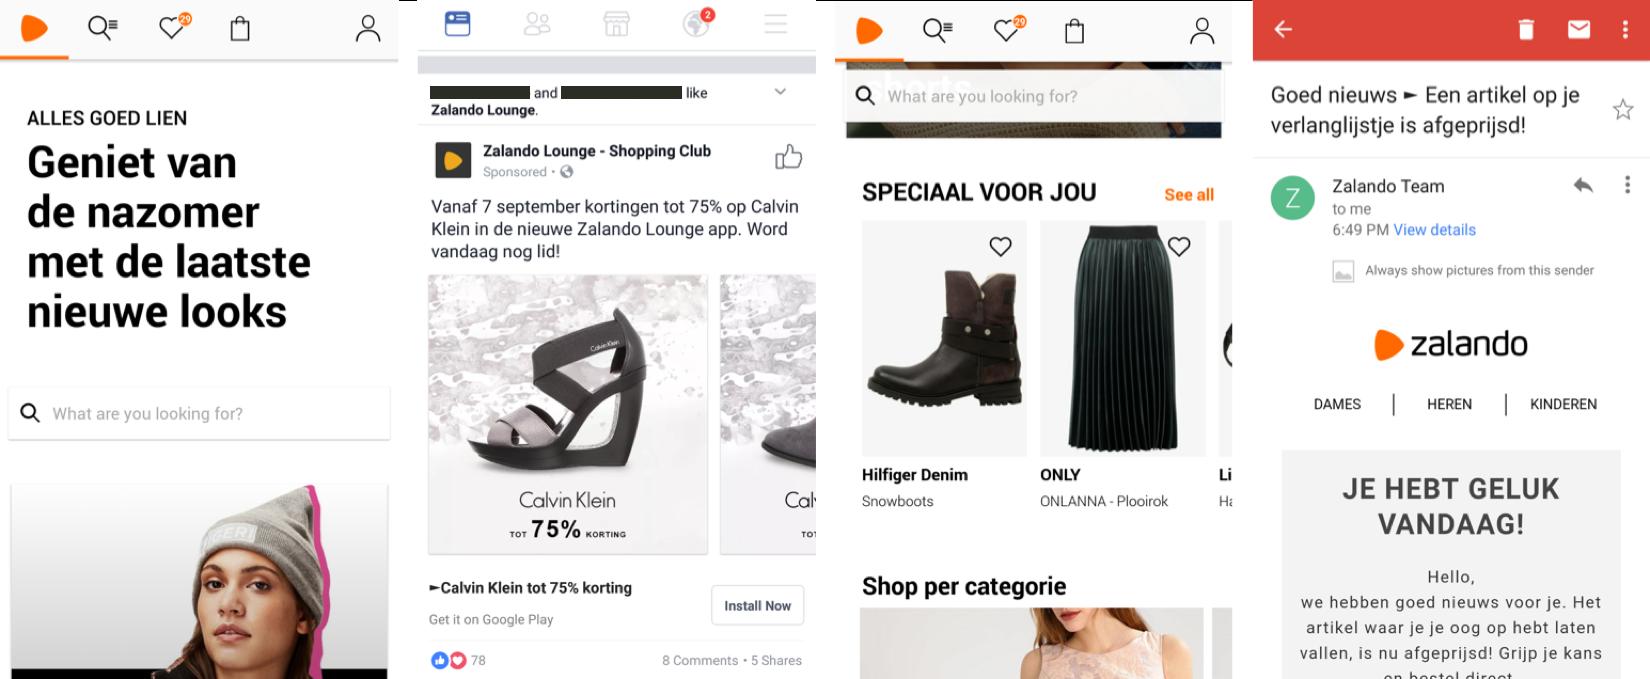 Mobile Marketing - Zalando